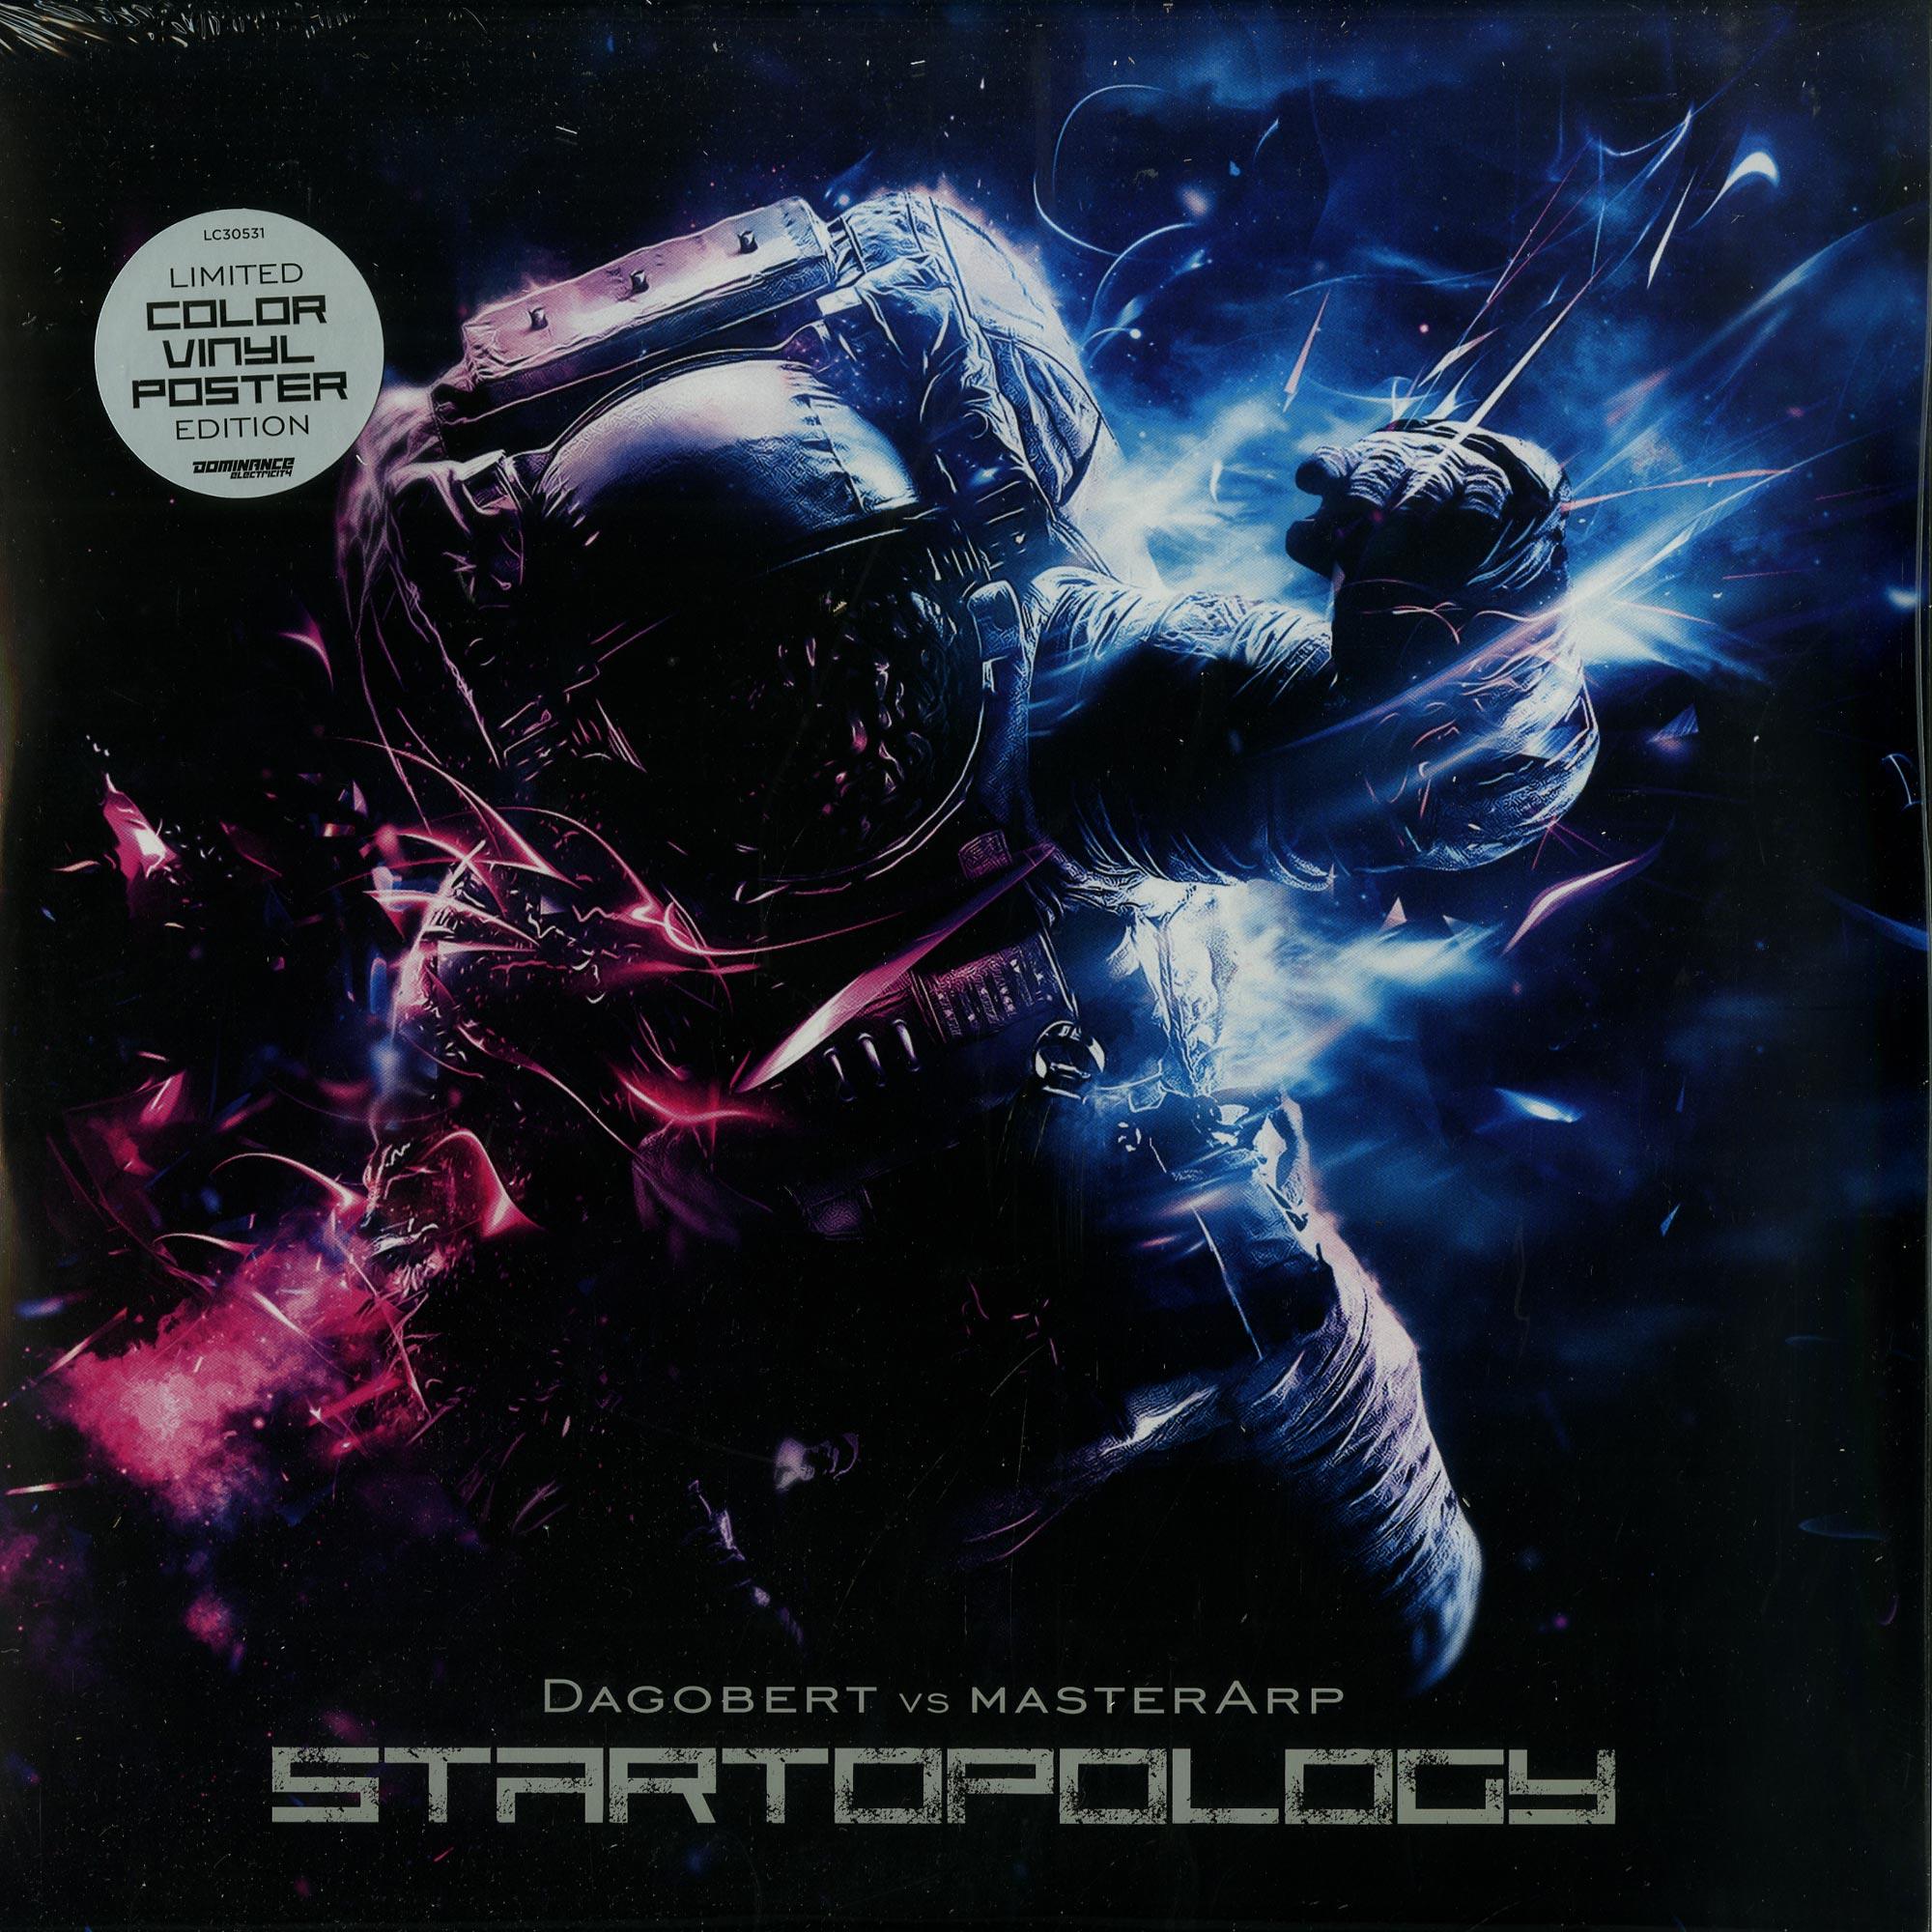 Dagobert vs Masterarp - STARTOPOLOGY